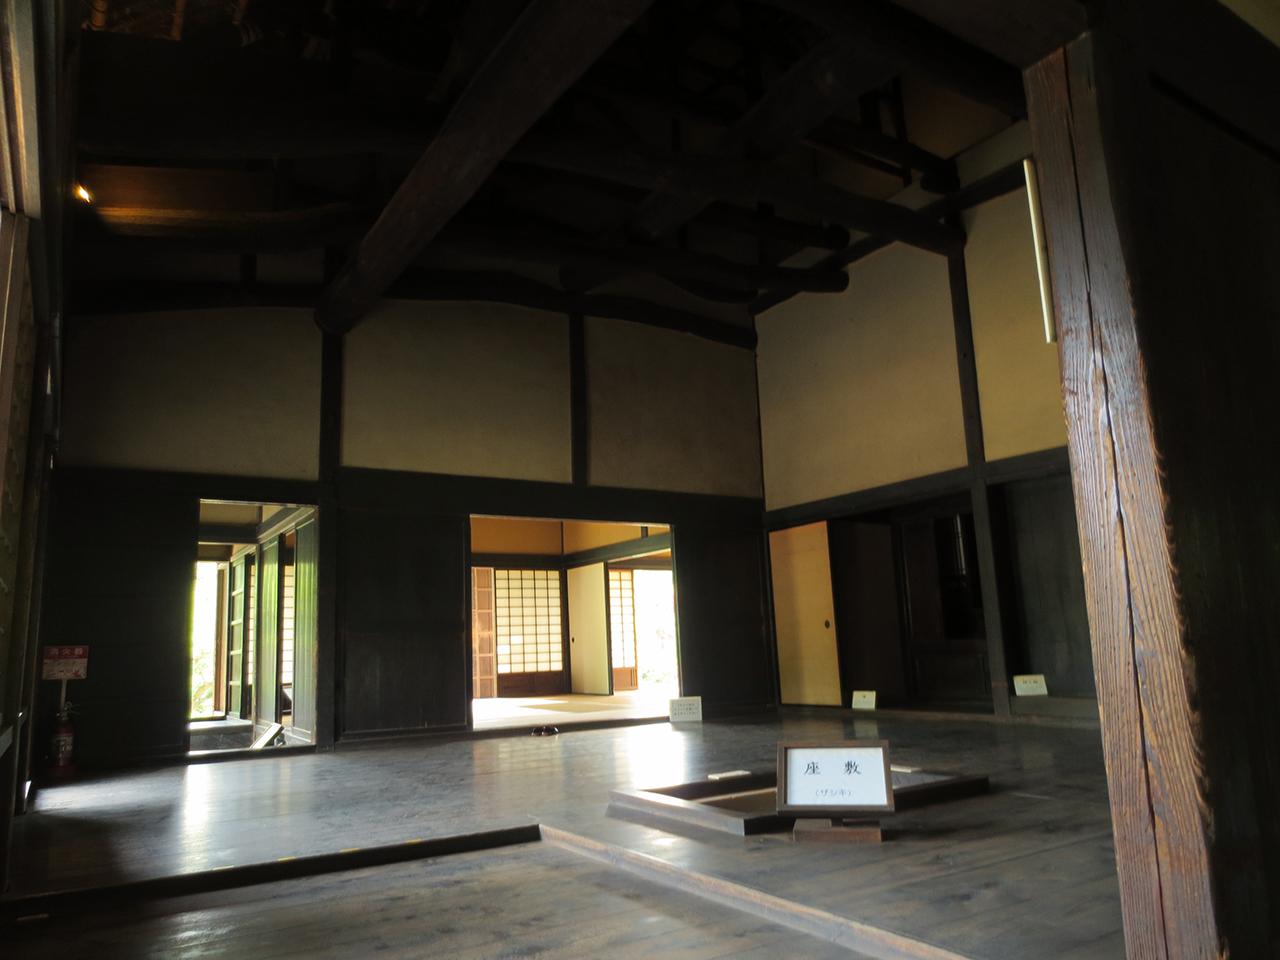 実籾本郷公園の投稿写真7